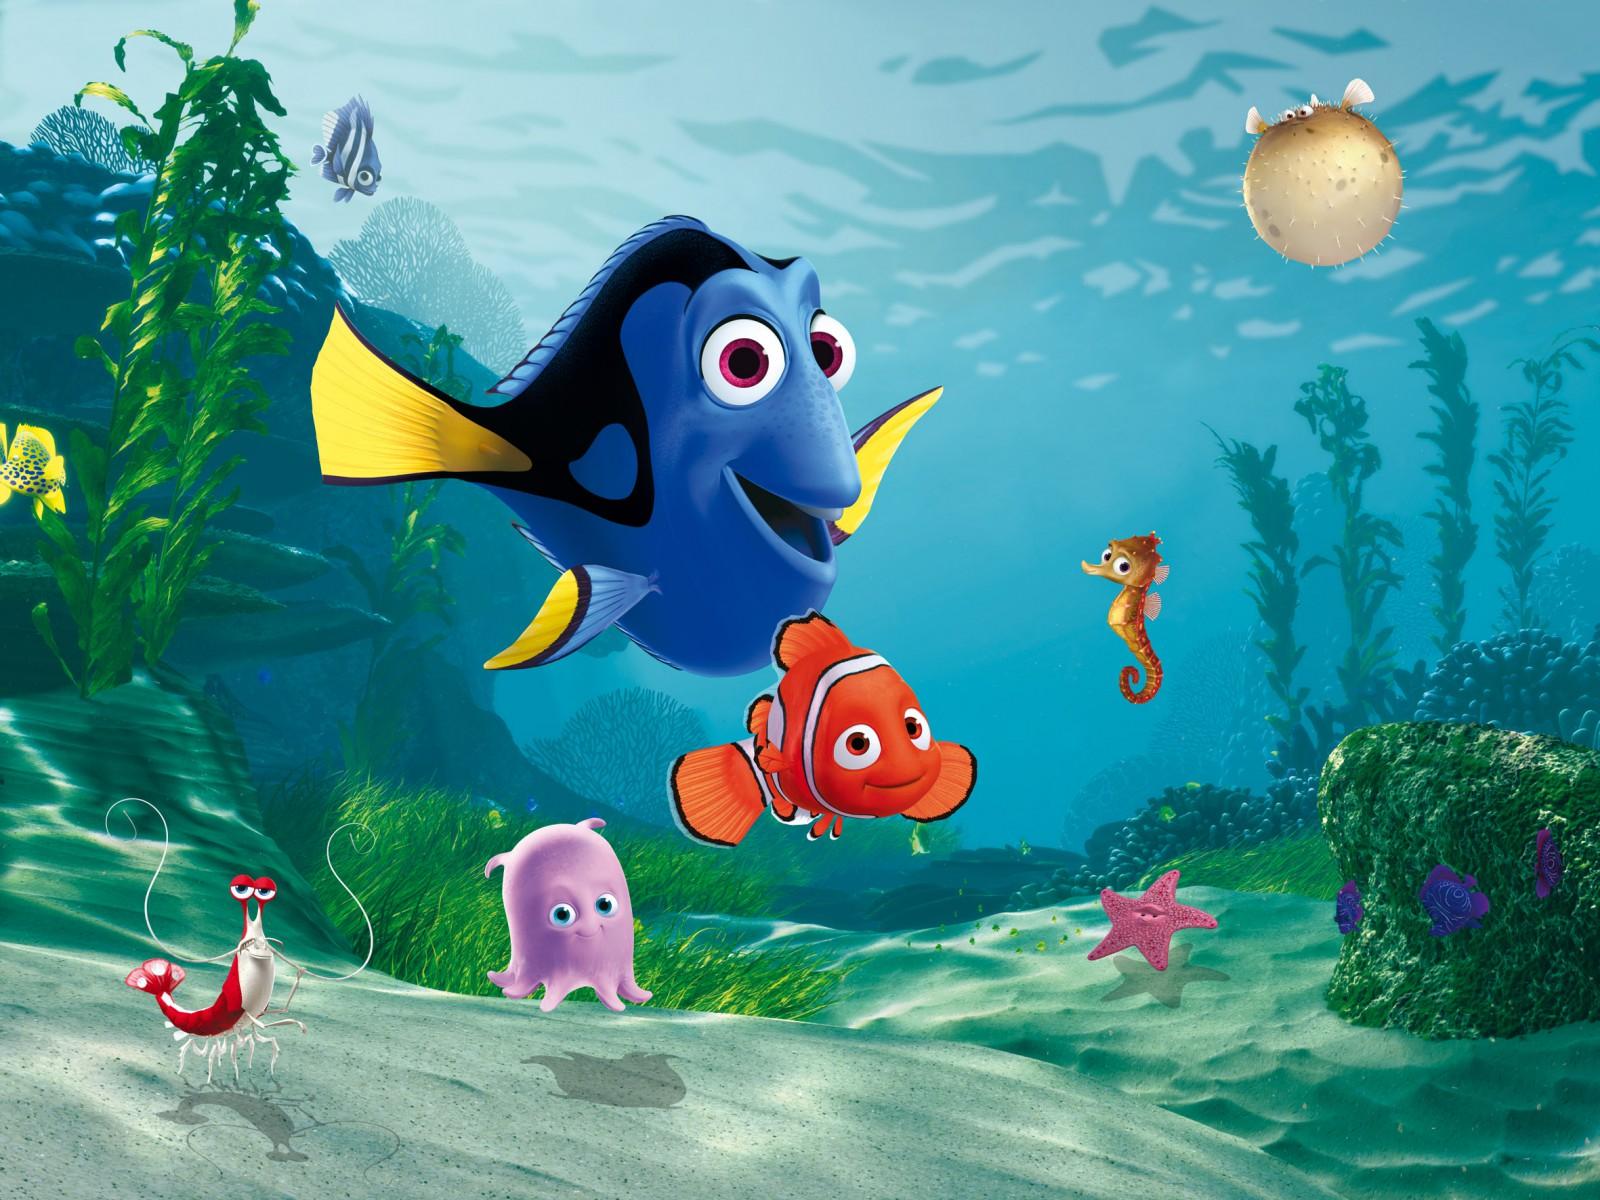 Full Size of Fototapeten Kinderzimmer Disney Xl Fototapete Tapete Findet Nemo Kinder Regal Weiß Wohnzimmer Sofa Regale Kinderzimmer Fototapeten Kinderzimmer